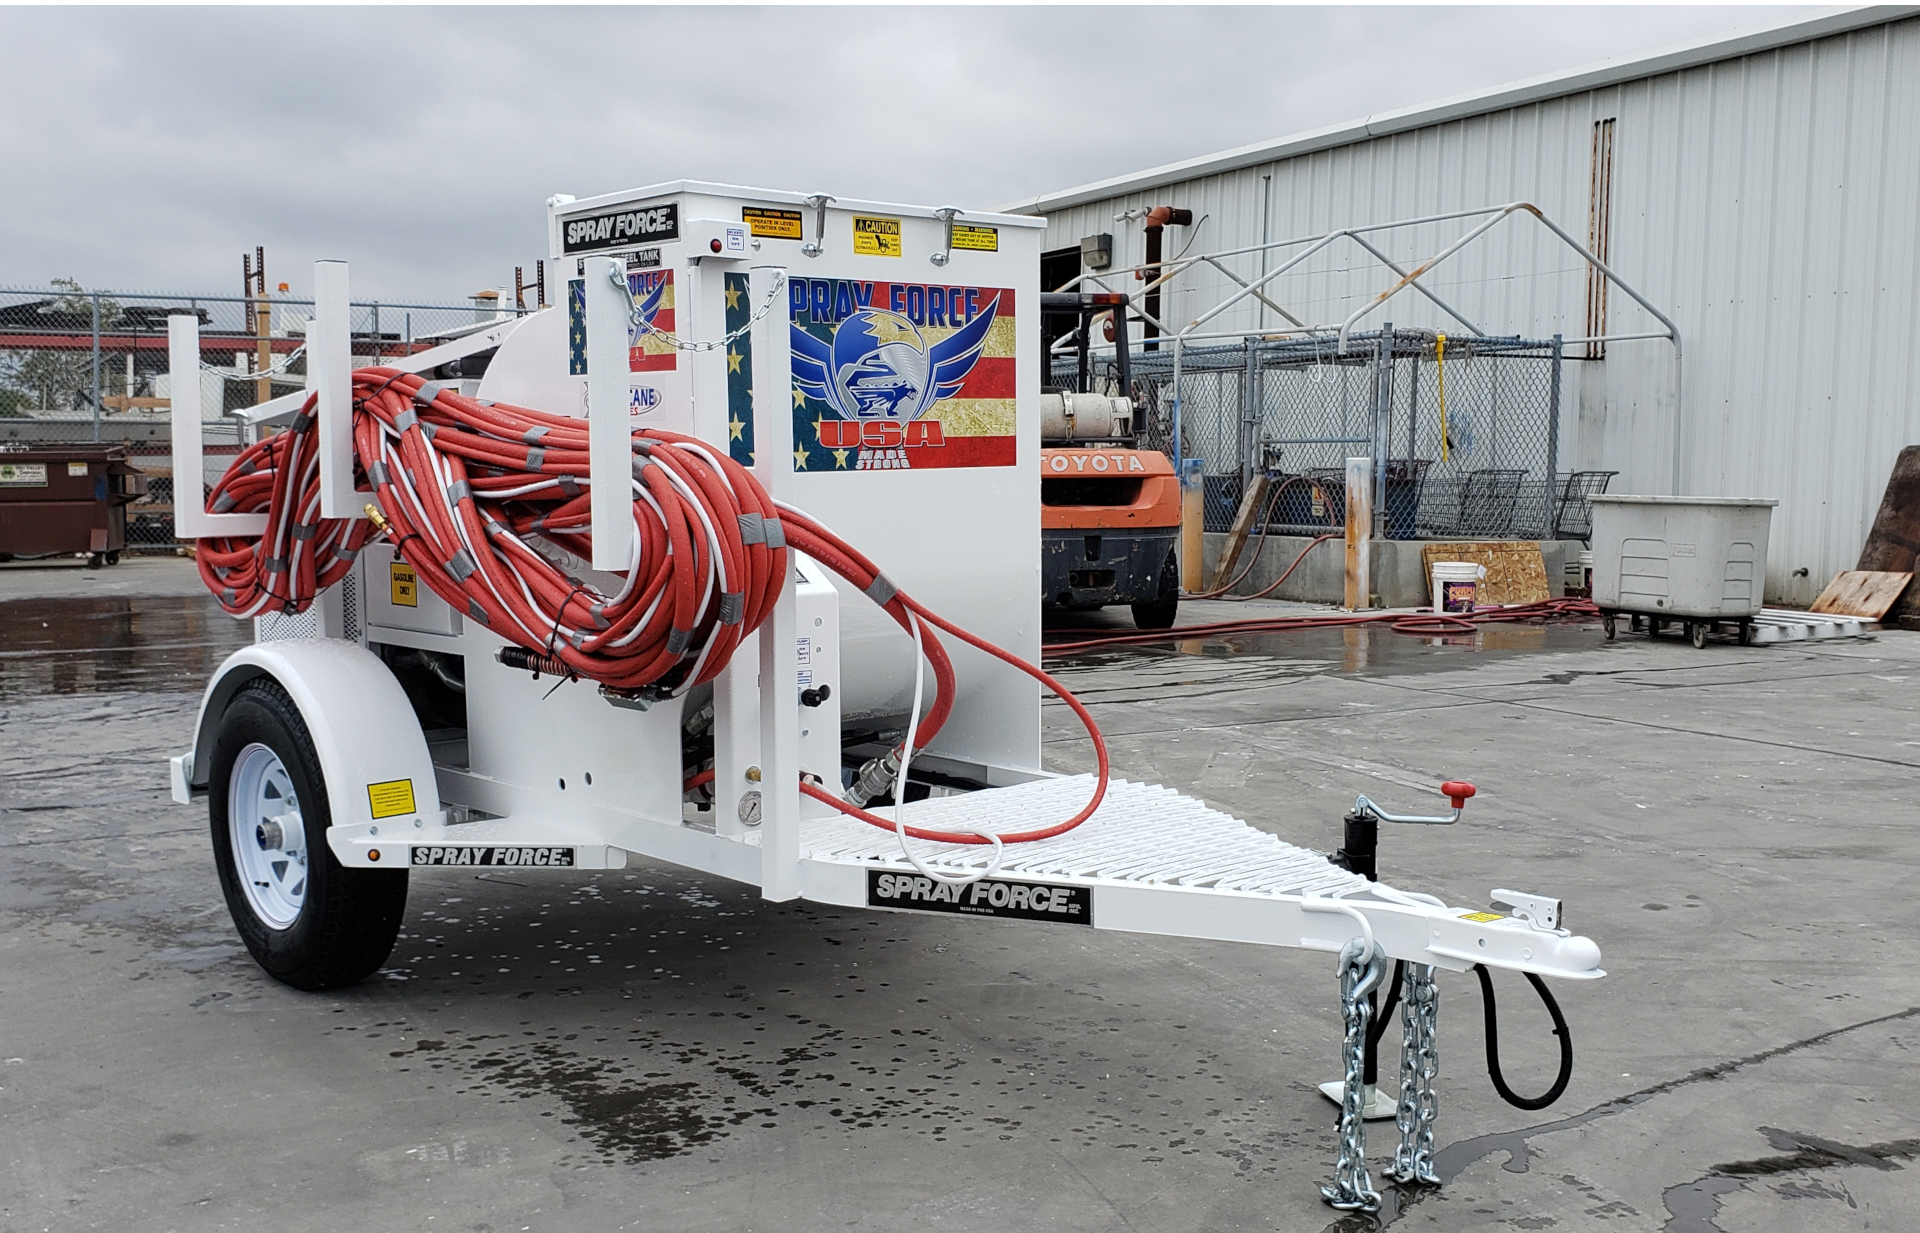 Hurricane 170 drywall rig